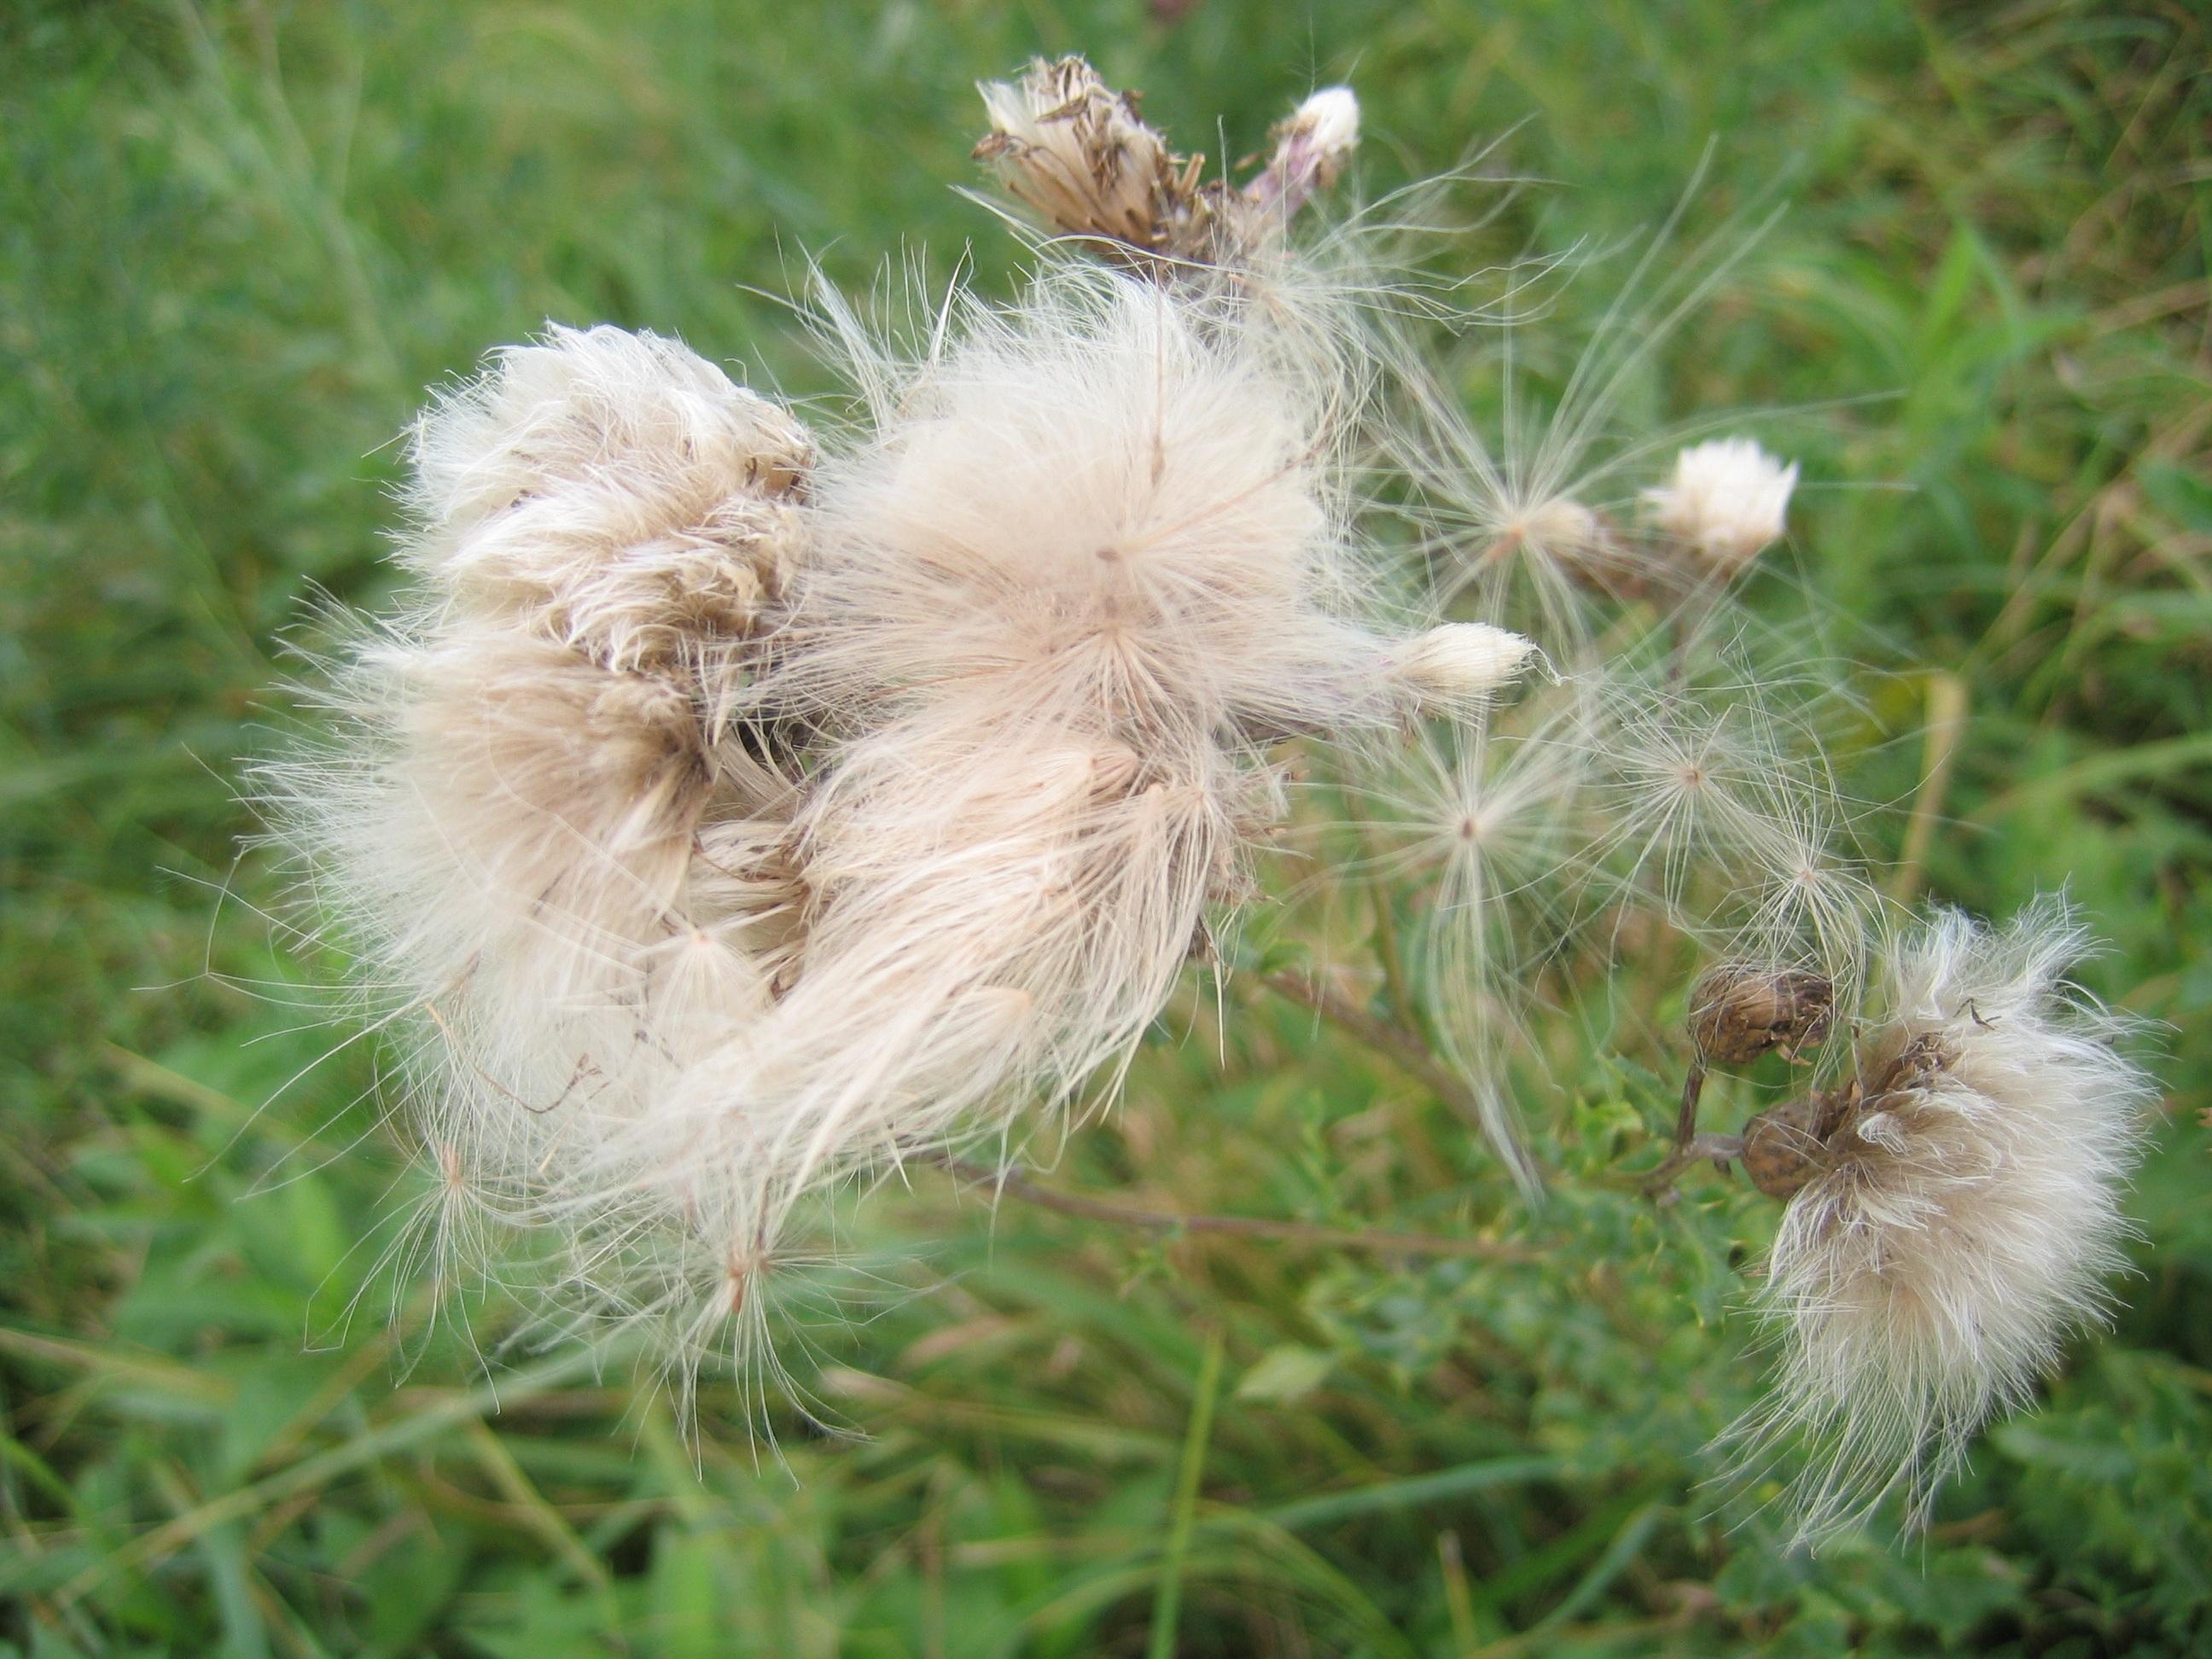 Hairy bittercress seed dispersal